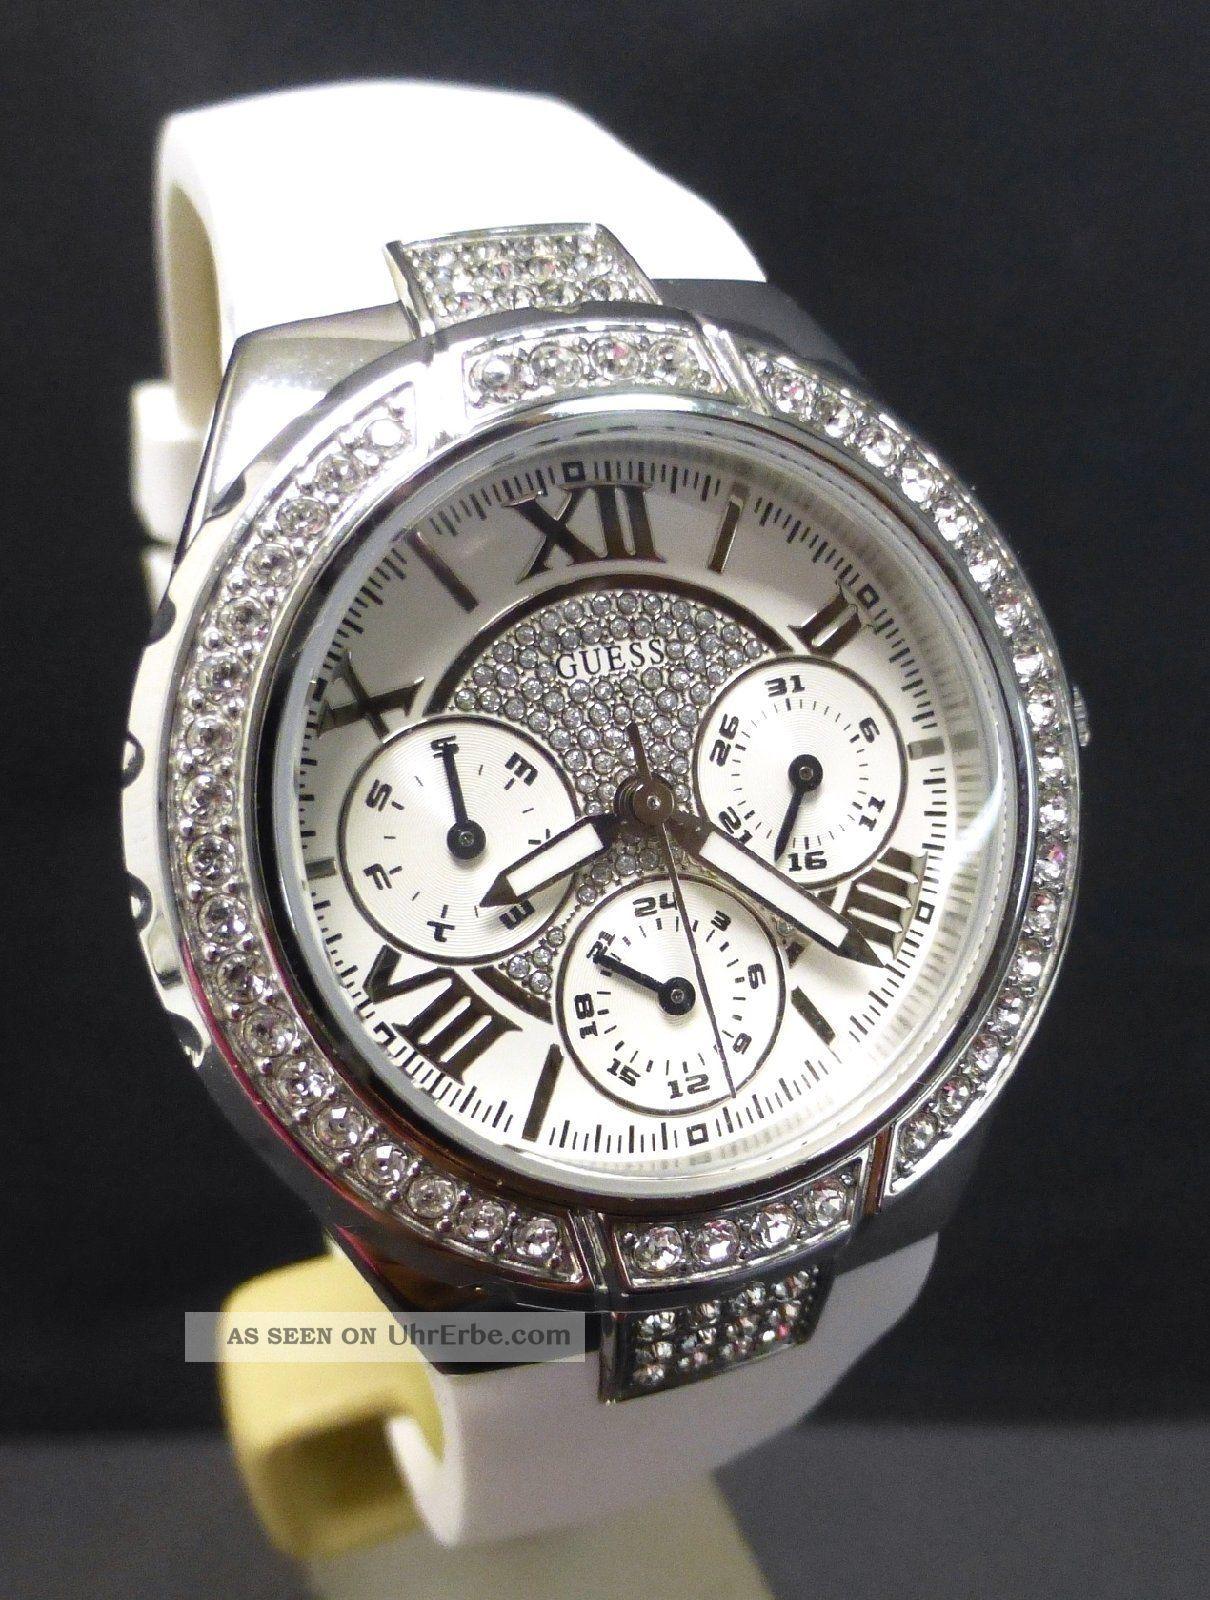 damenuhr guess chronograph viva ladies armbanduhr uhr silikonband damen chrono. Black Bedroom Furniture Sets. Home Design Ideas